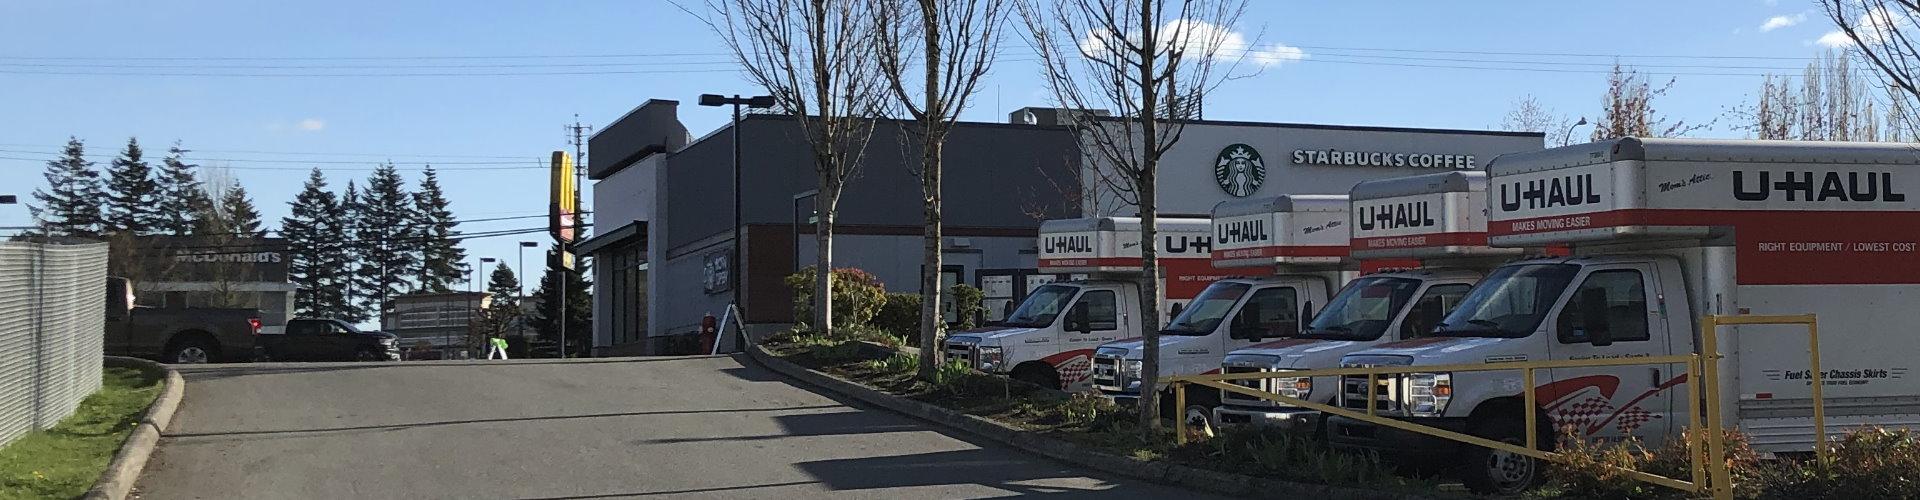 U-haul Trucks Onsite